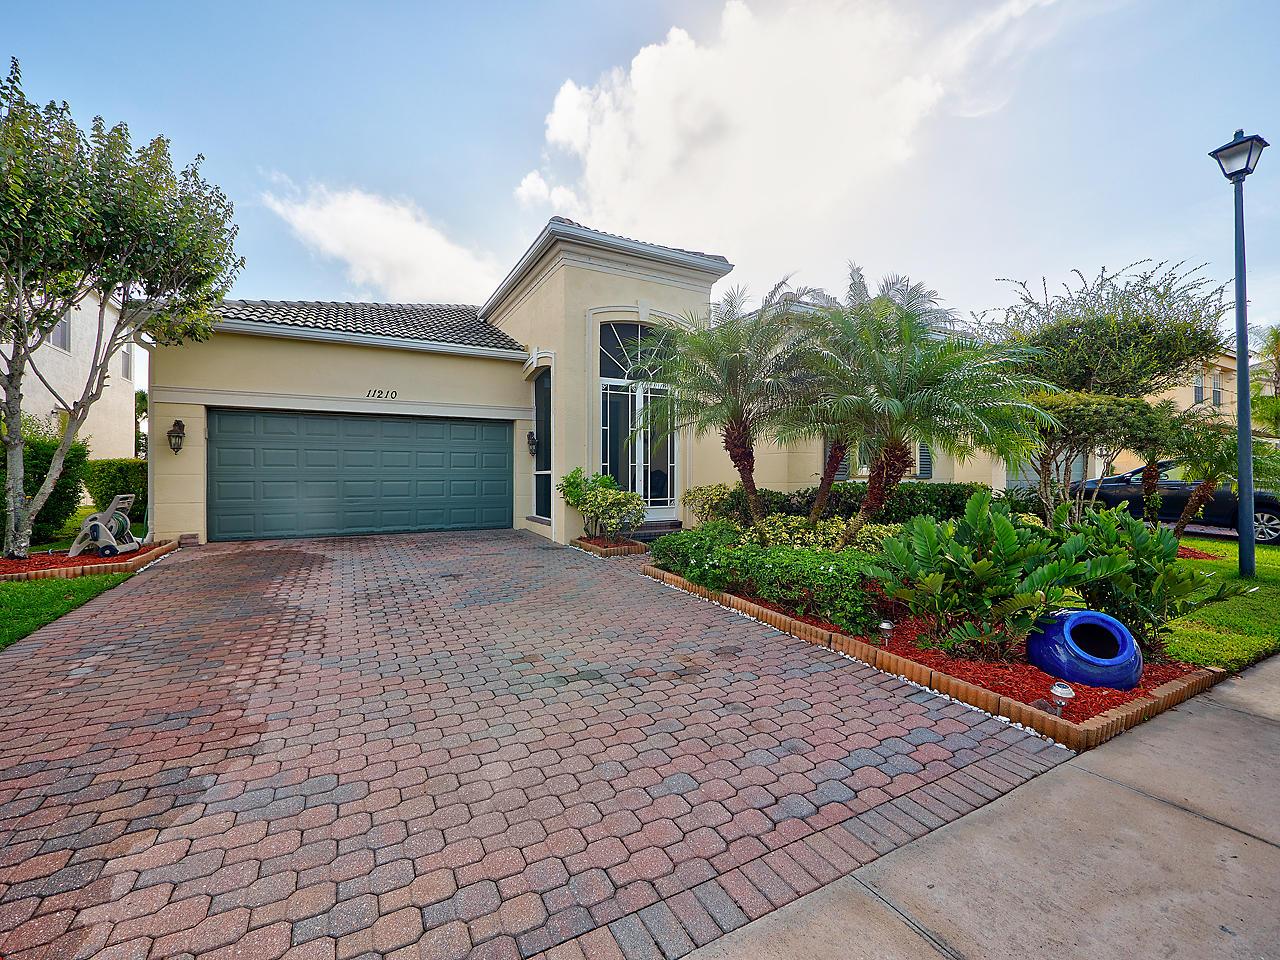 11210 SW Kingslake Circle - Port St Lucie, Florida